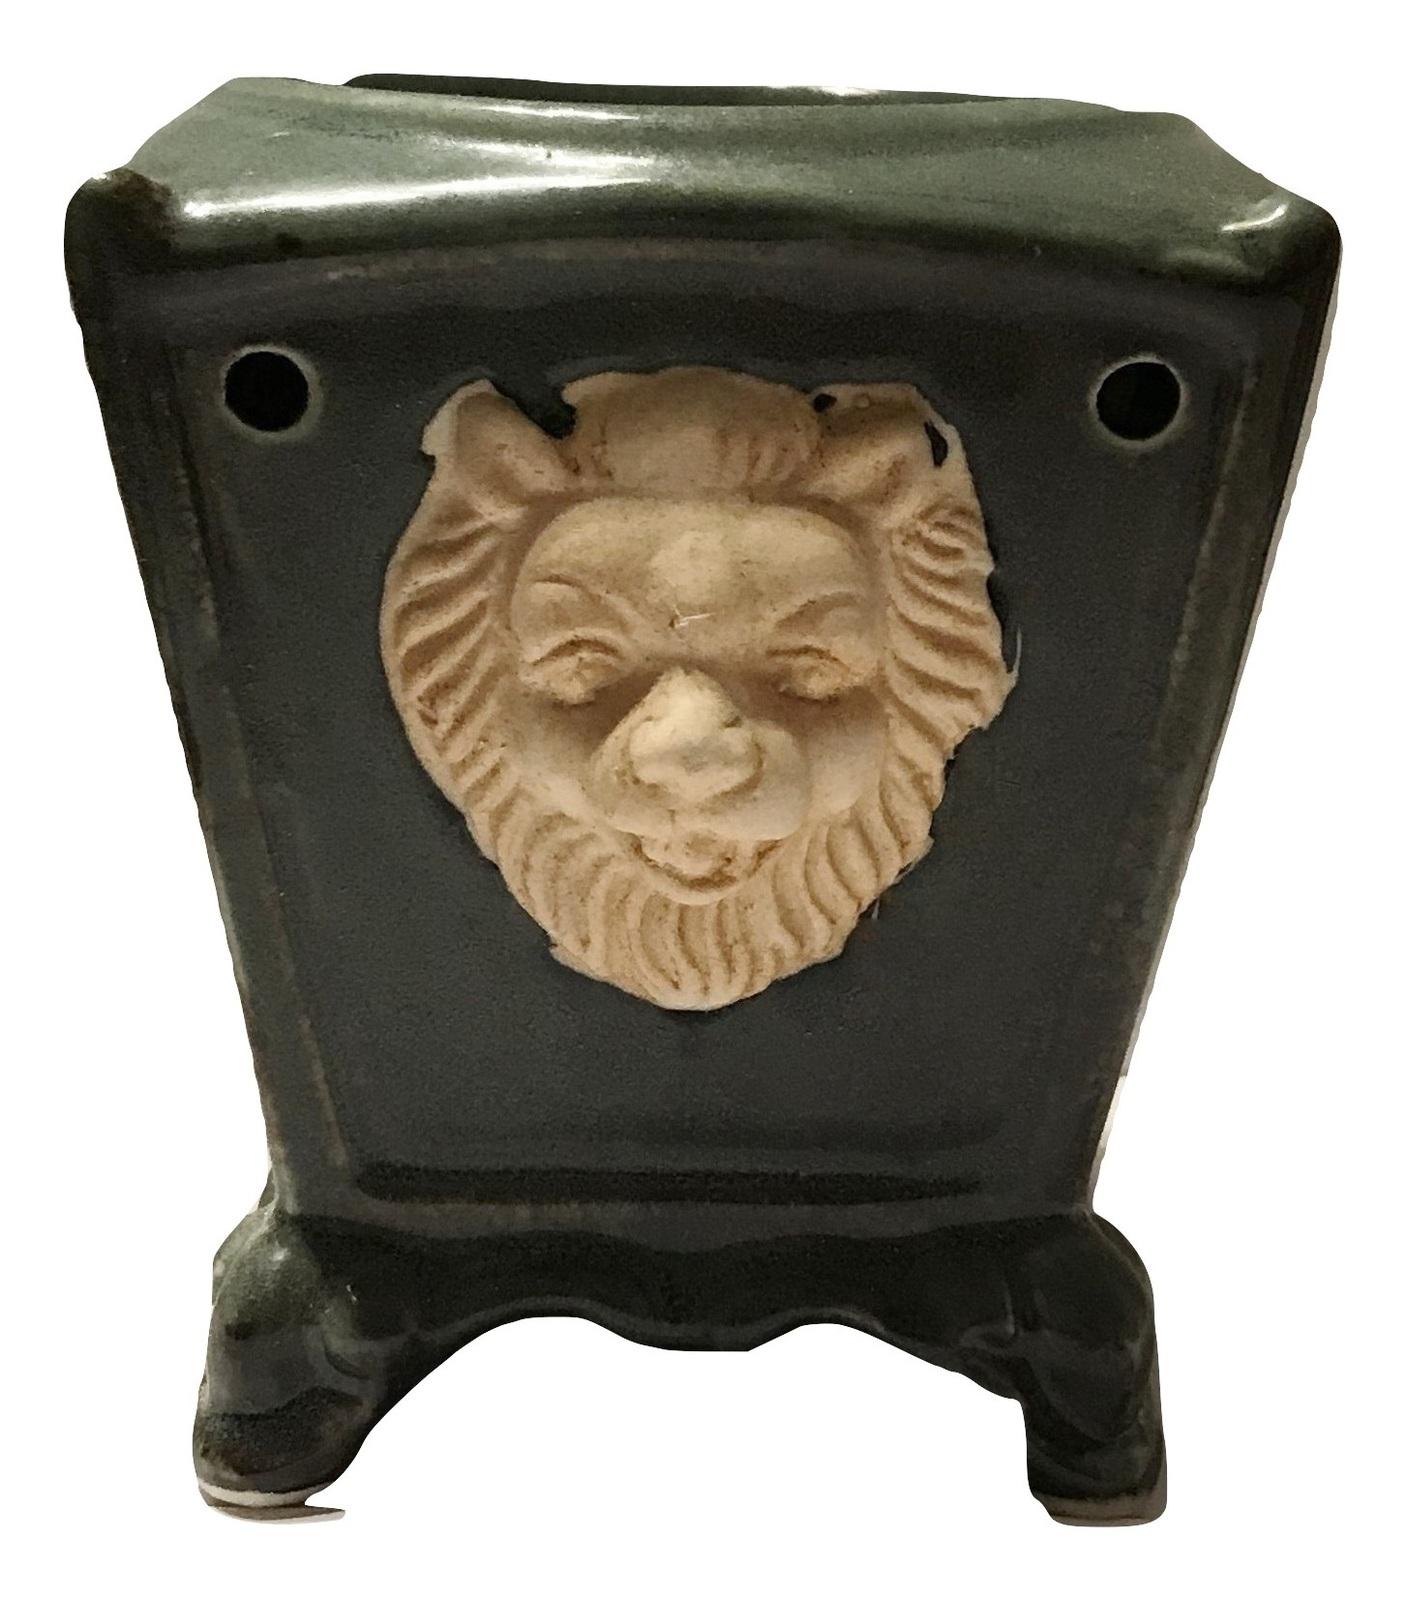 Green ceramic lion oil burner 2 burned